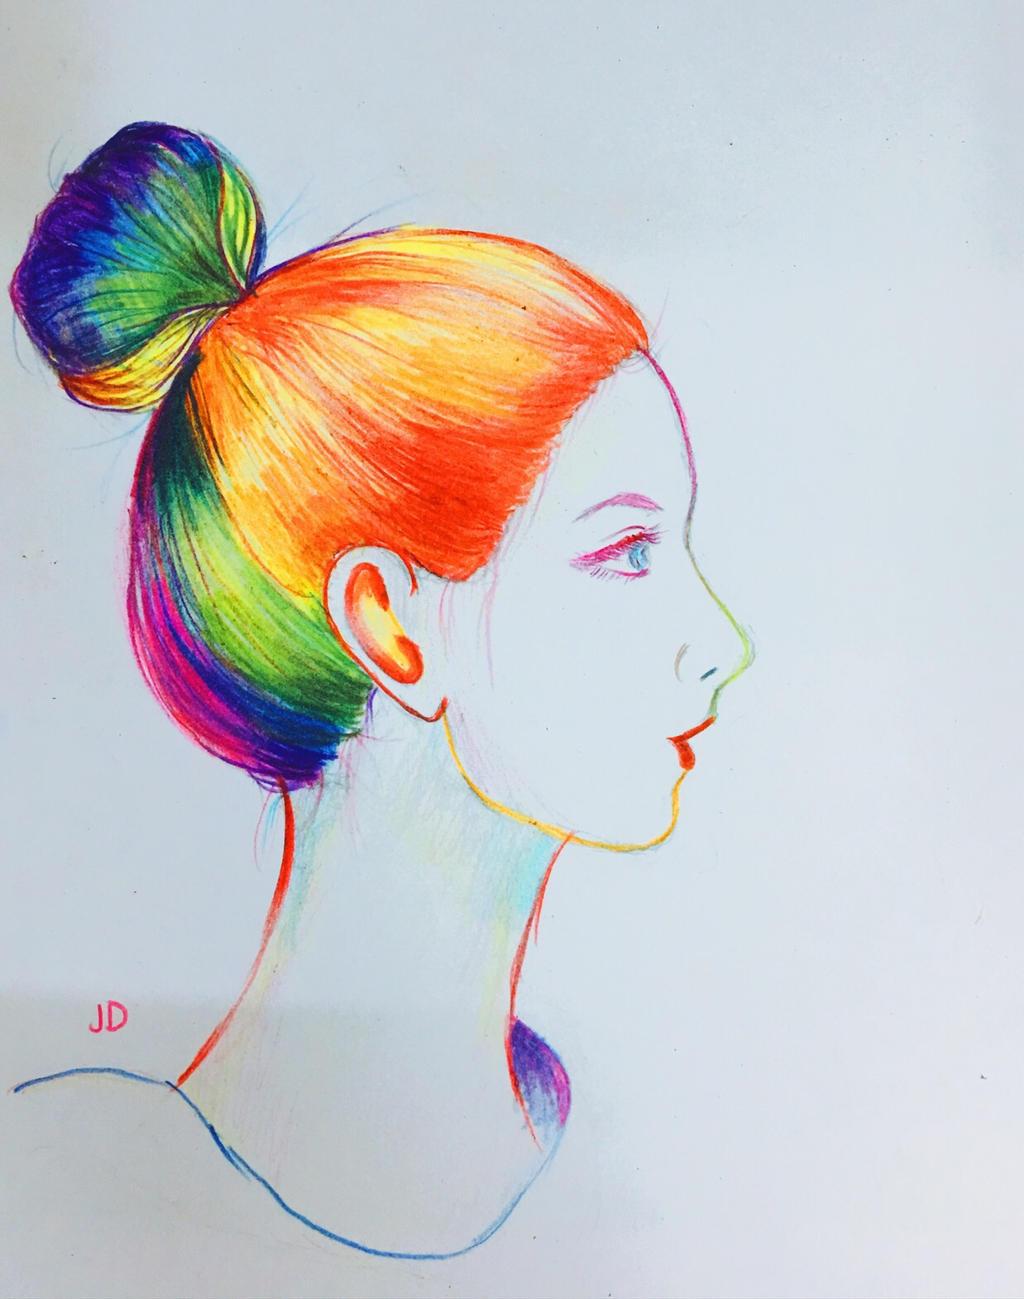 Girl With Rainbow Hair By Jacelyndinh On Deviantart